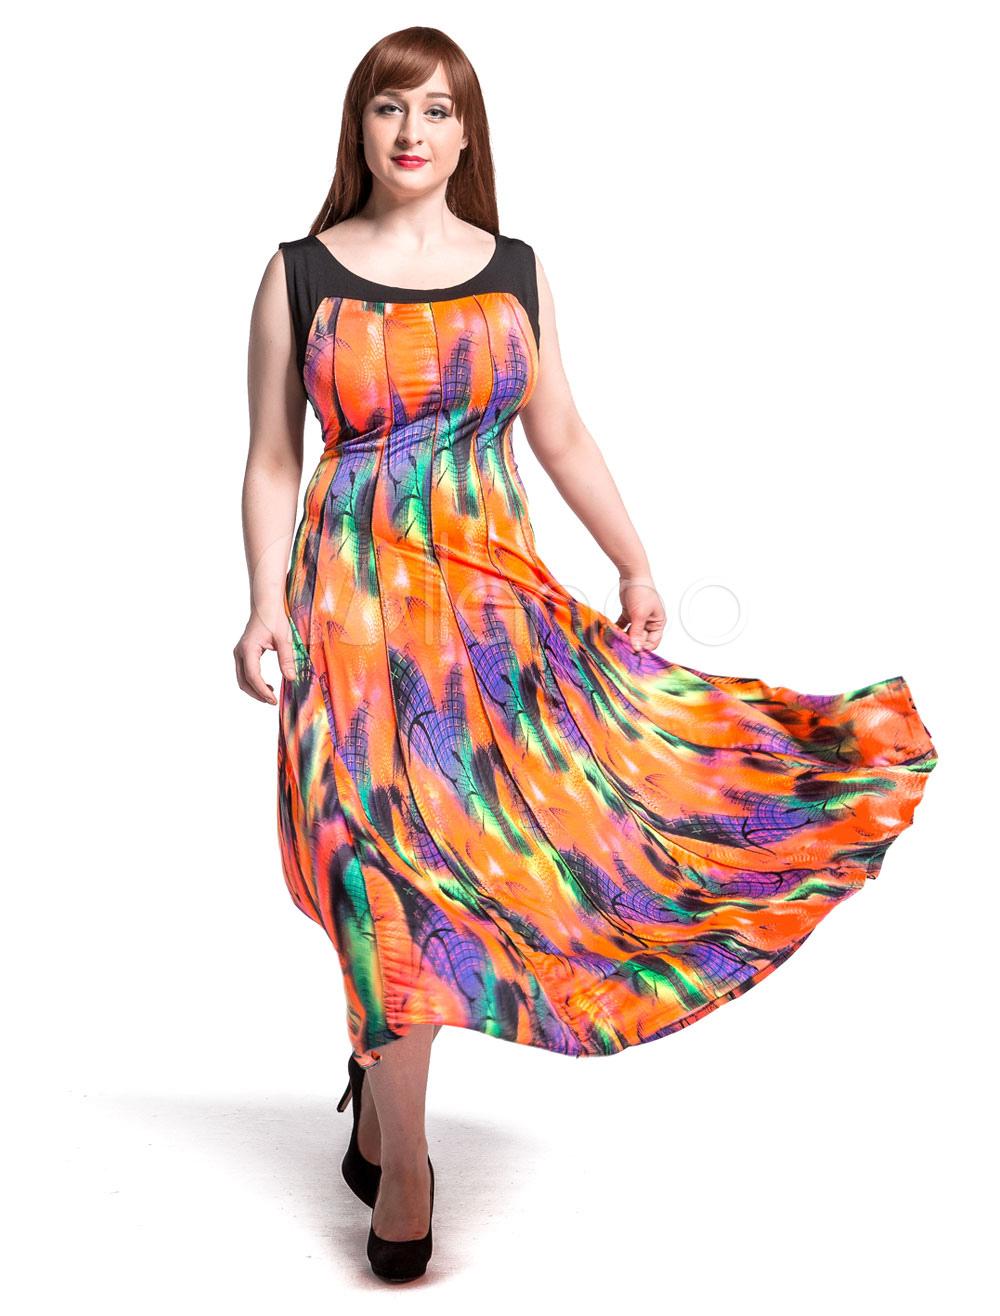 Milanoo / Sleeveless Maxi Dress Pleated Chiffon Plus Size Long Dress For Women